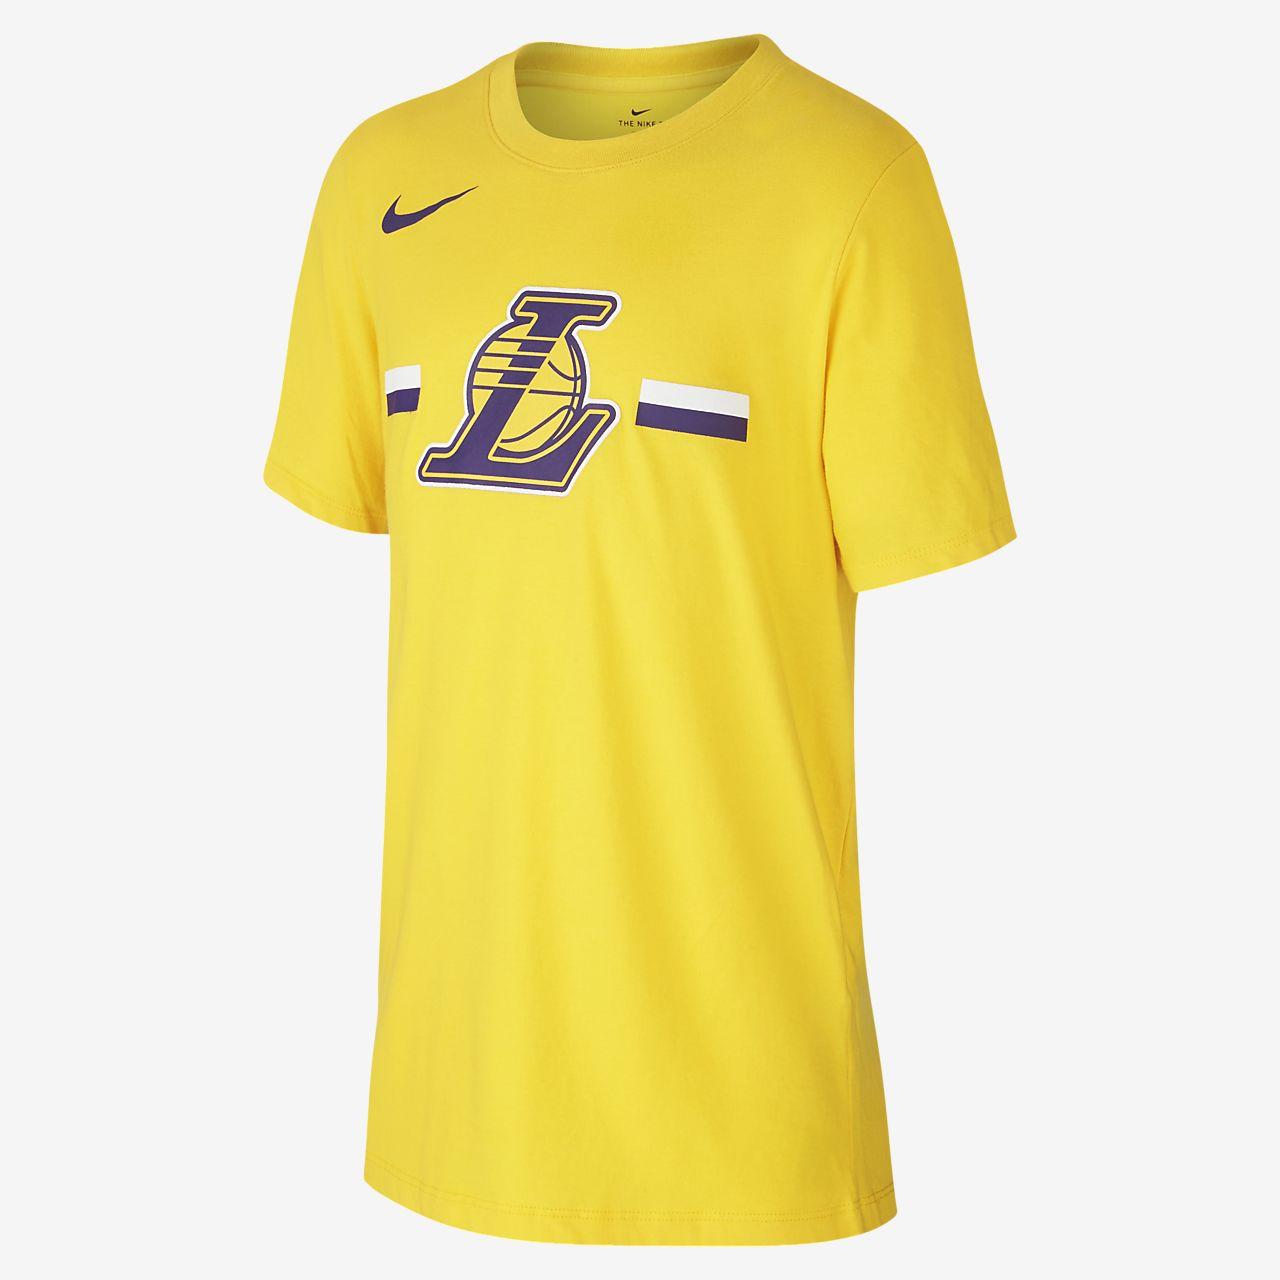 Los Angeles Lakers Nike Dri-FIT Logo Older Kids' NBA T-Shirt